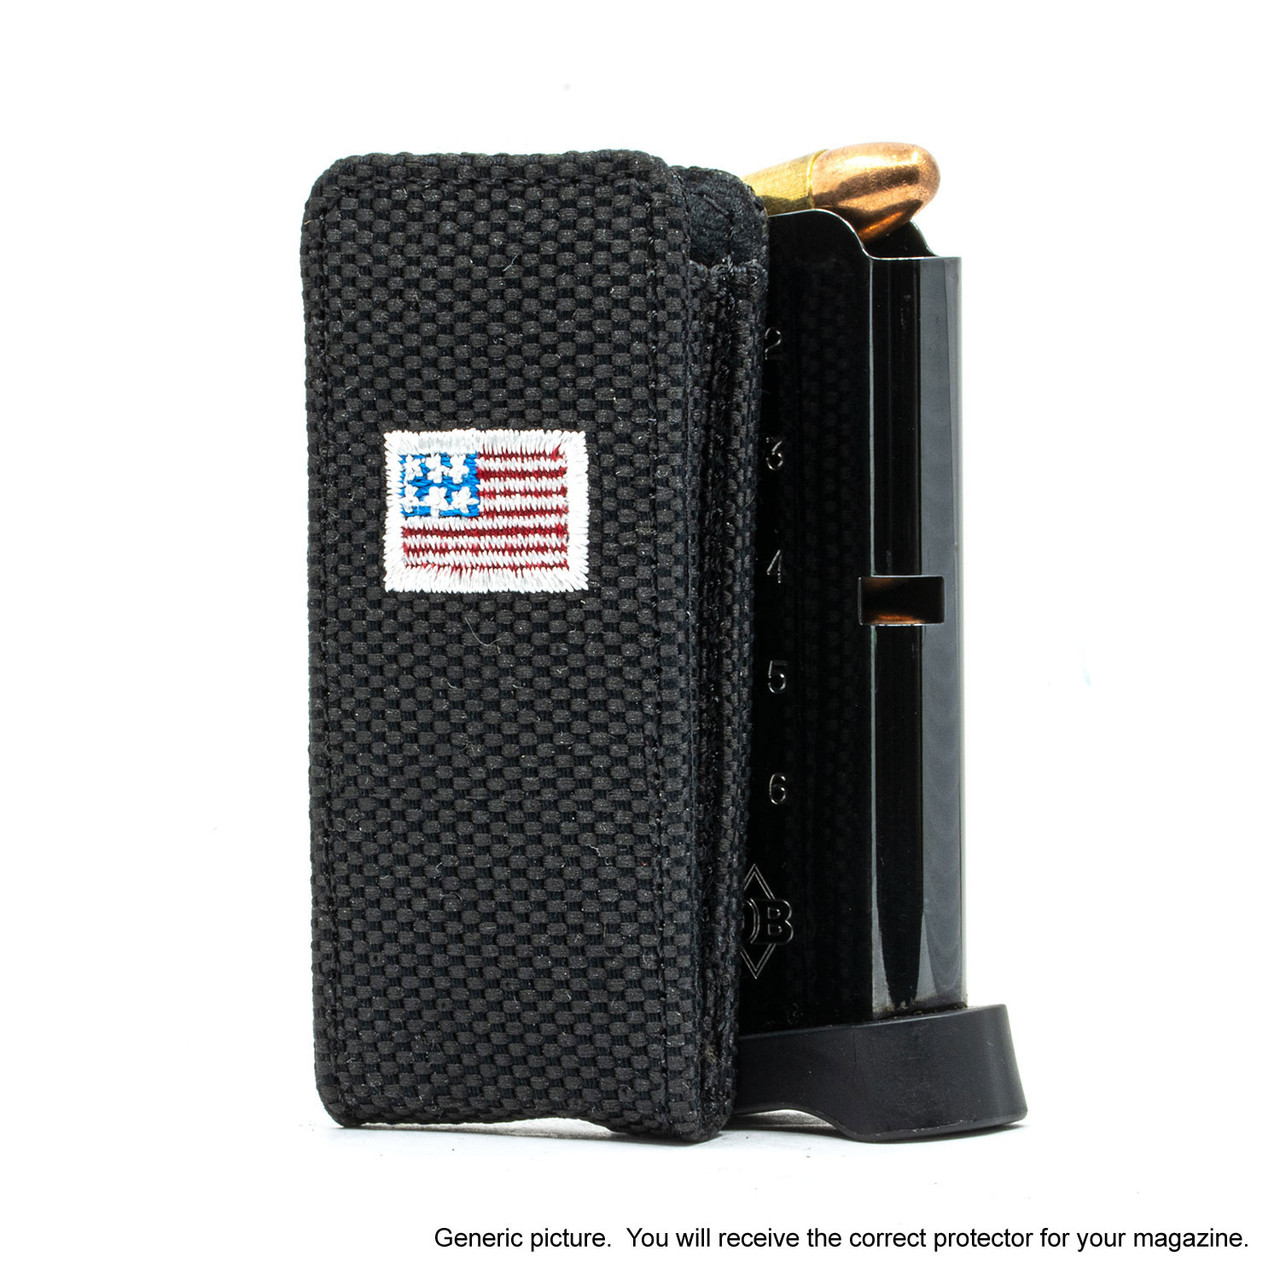 CZ 75D Compact Black Flag Magazine Pocket Protector